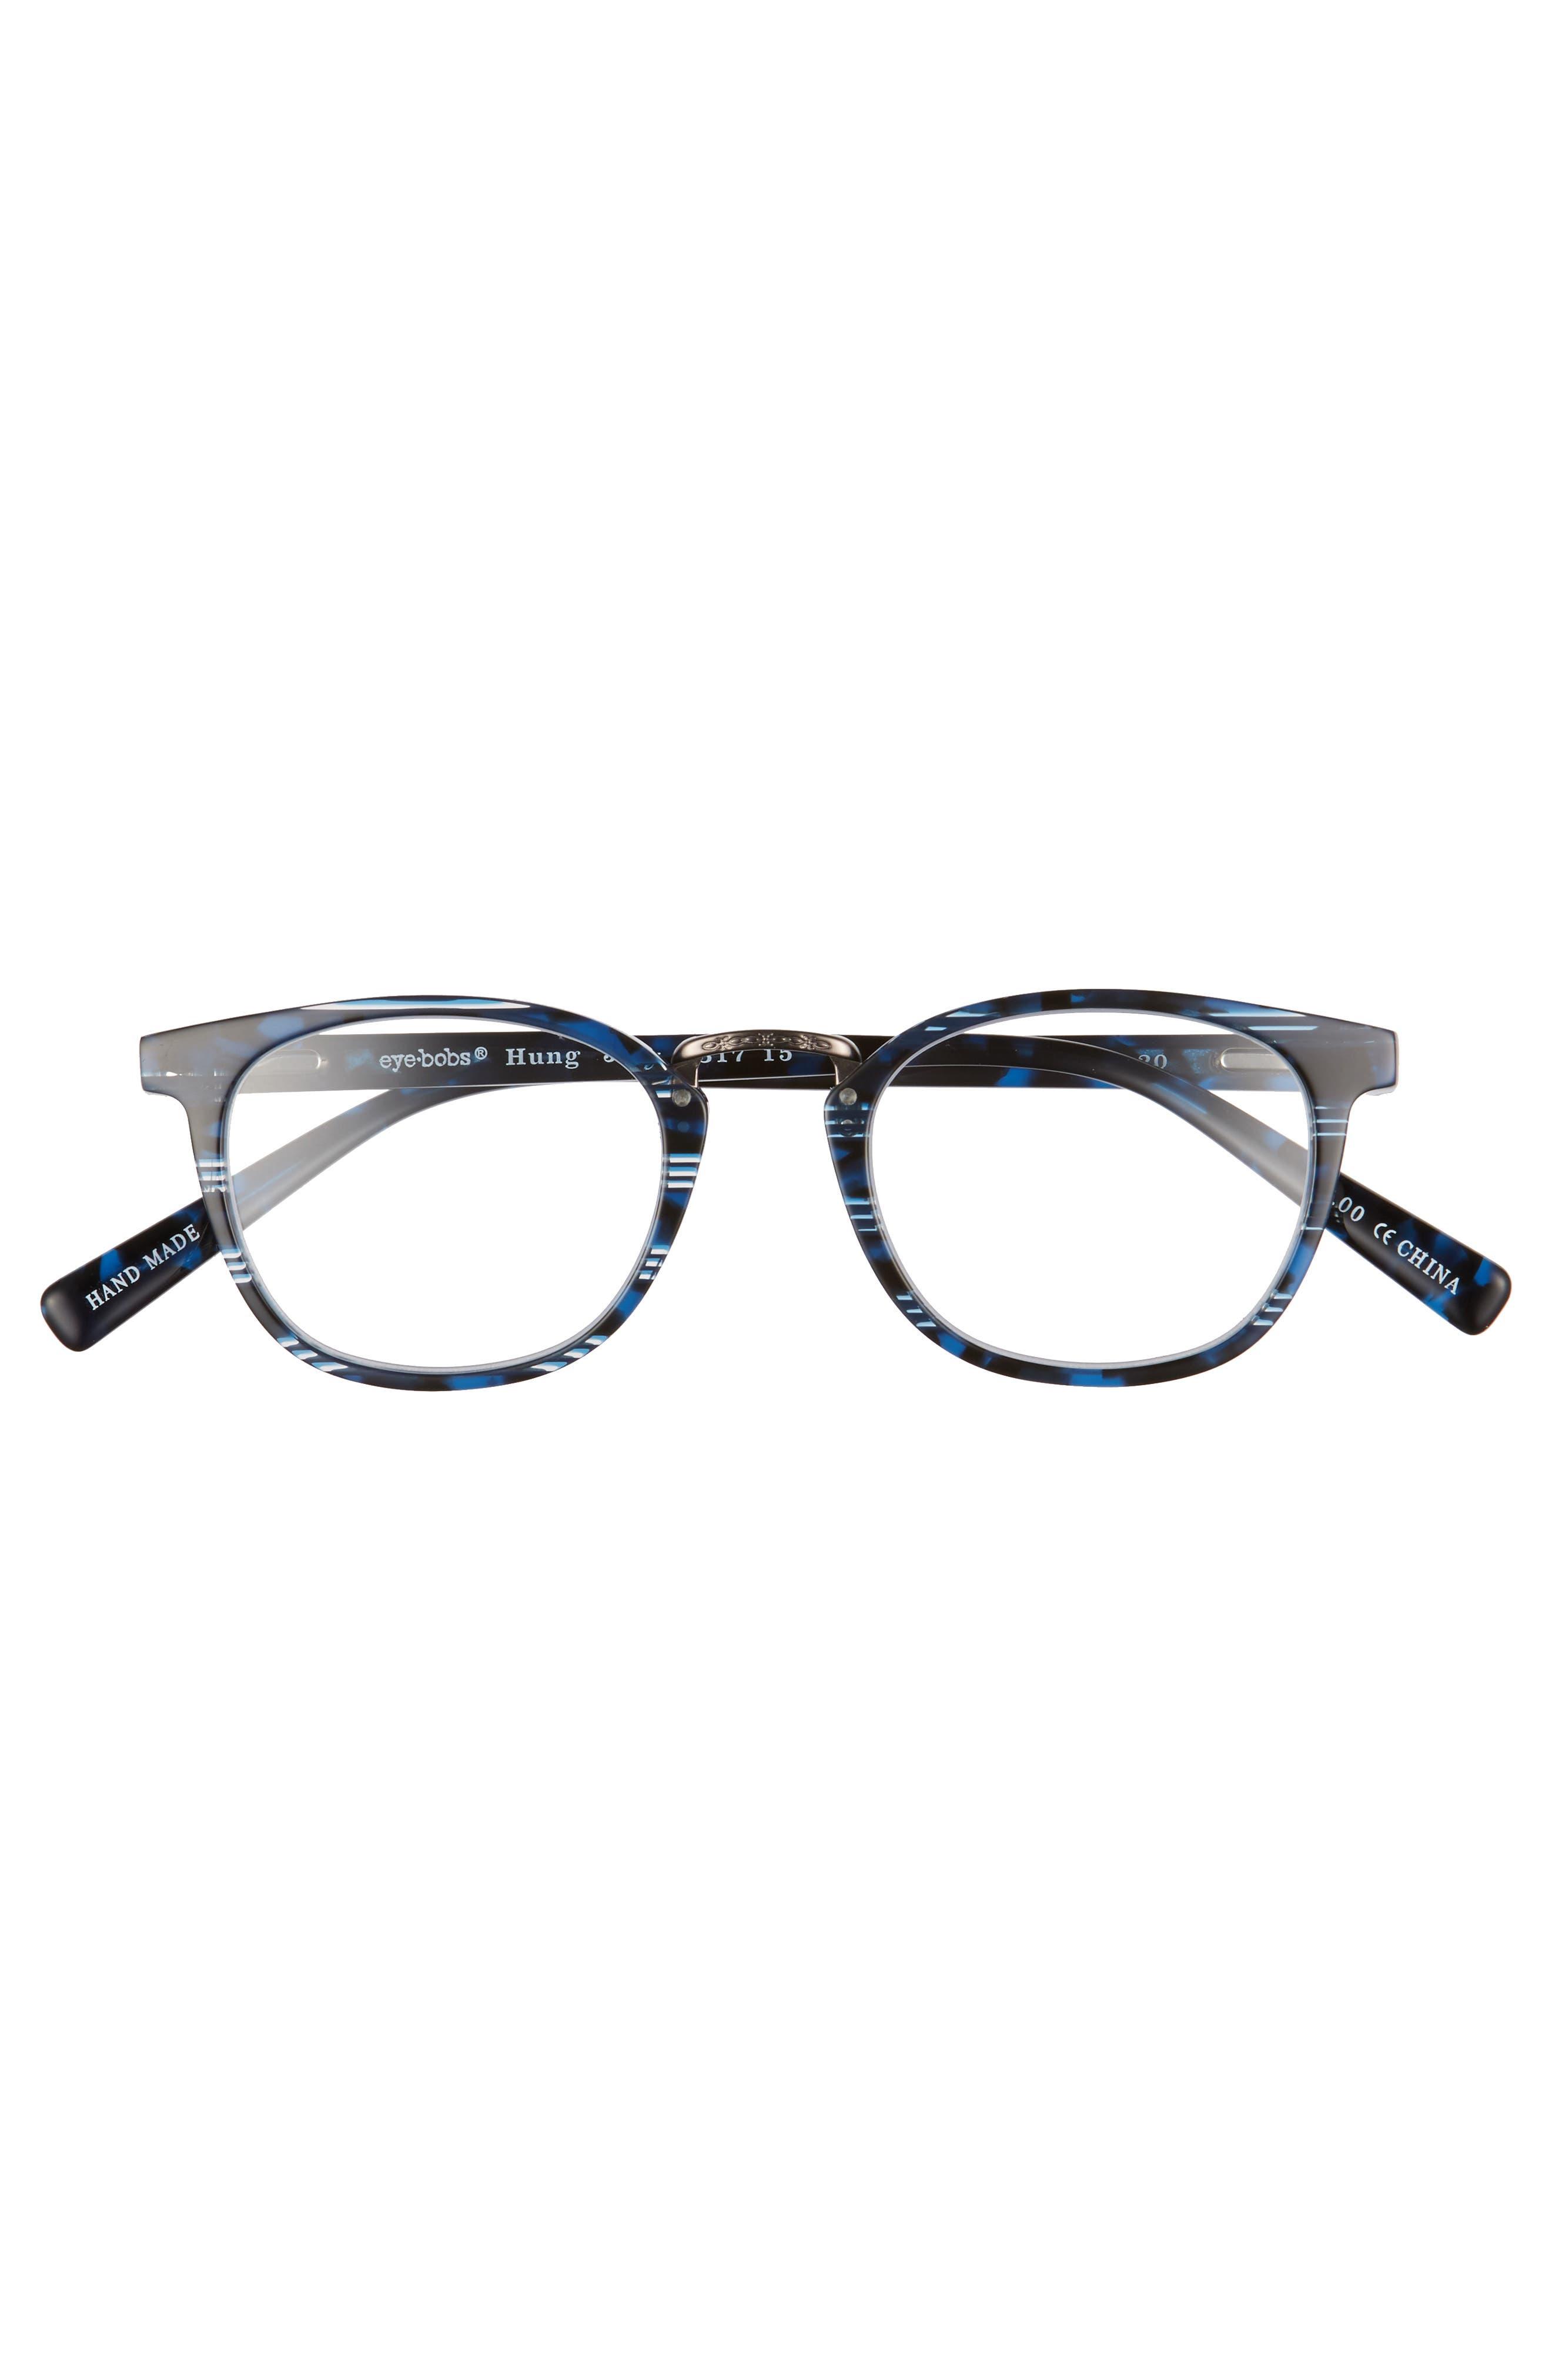 Hung Jury 46mm Reading Glasses,                             Alternate thumbnail 2, color,                             BLUE TORTOISE